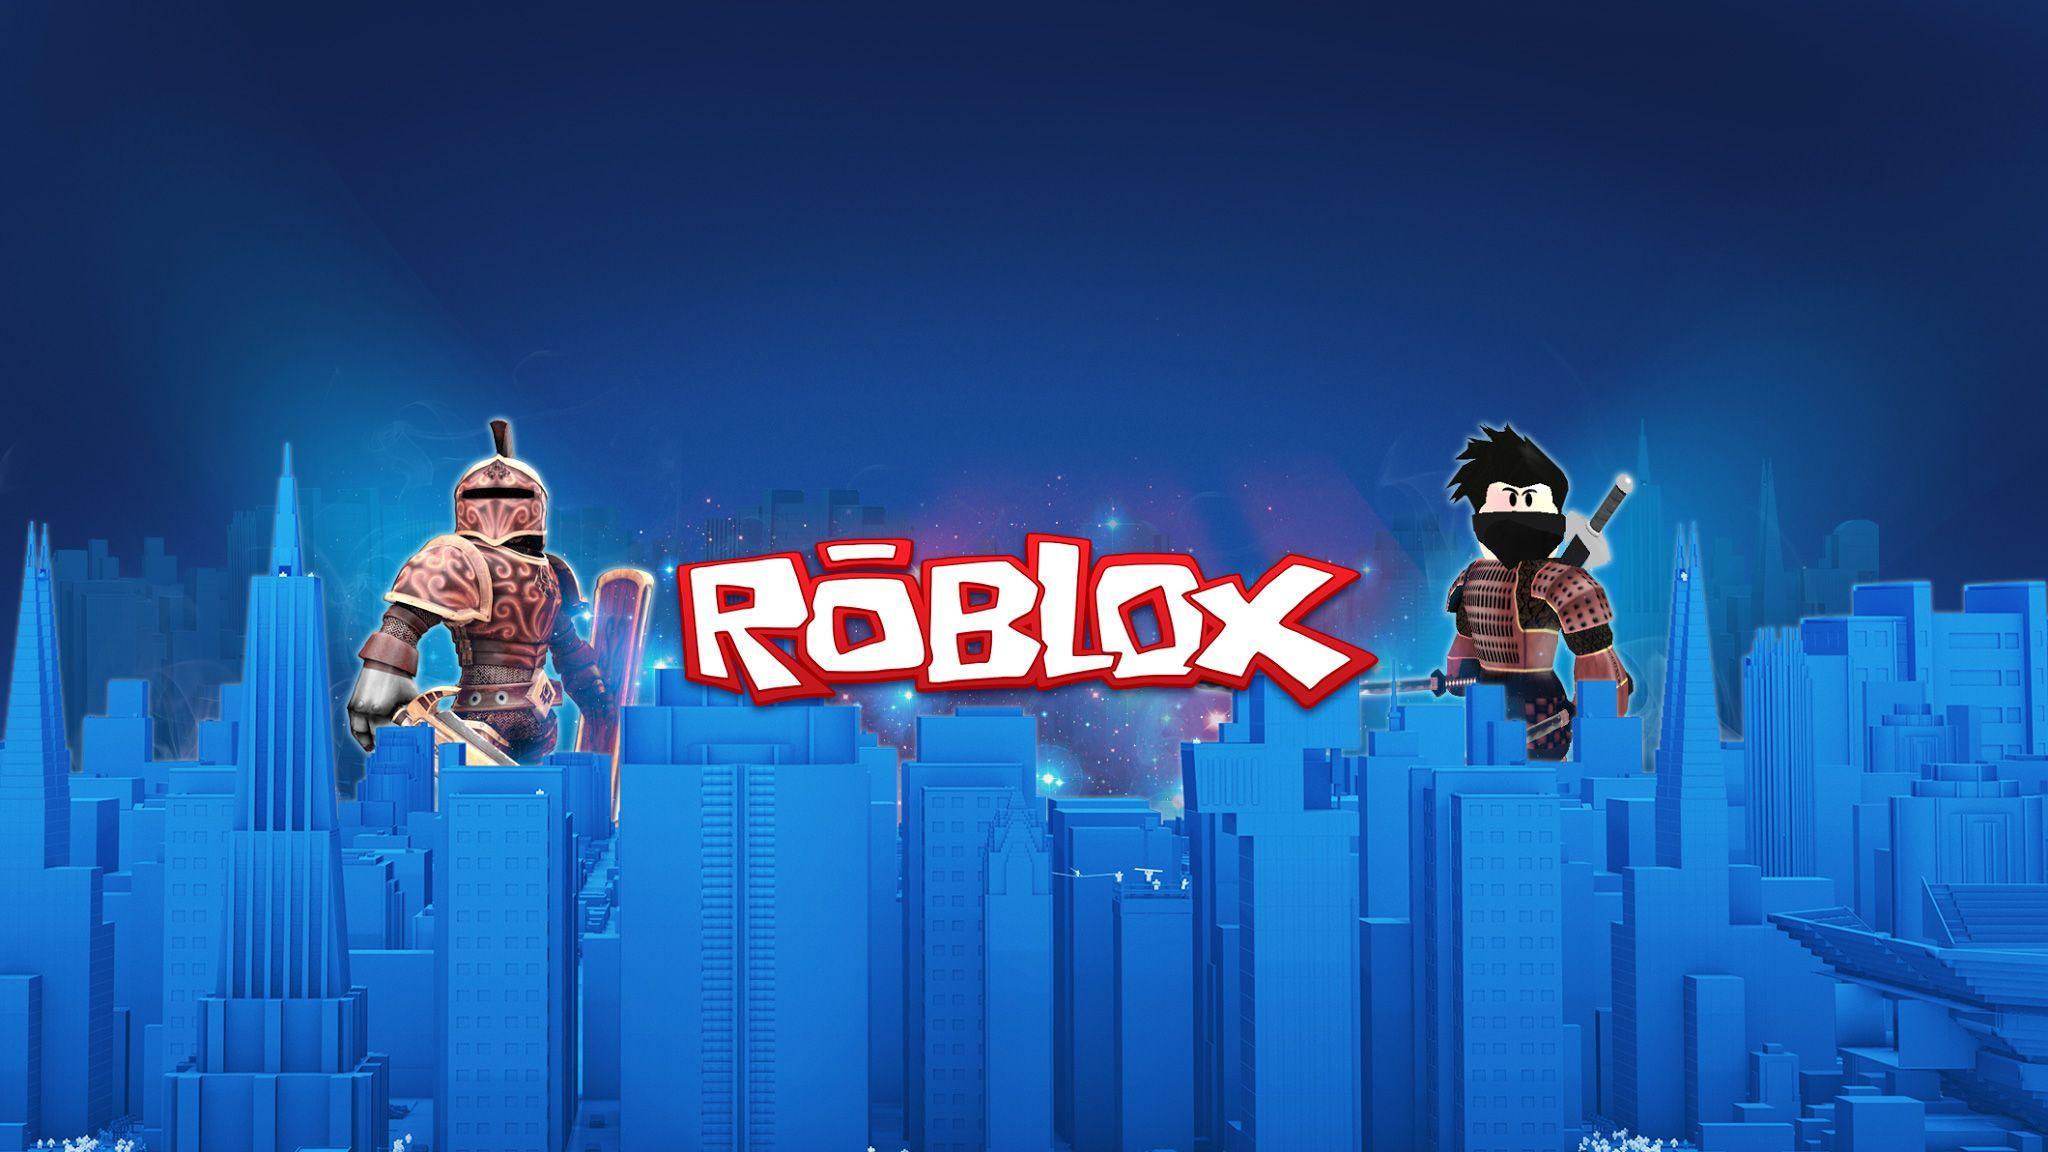 Wallpaper For Laptop Roblox